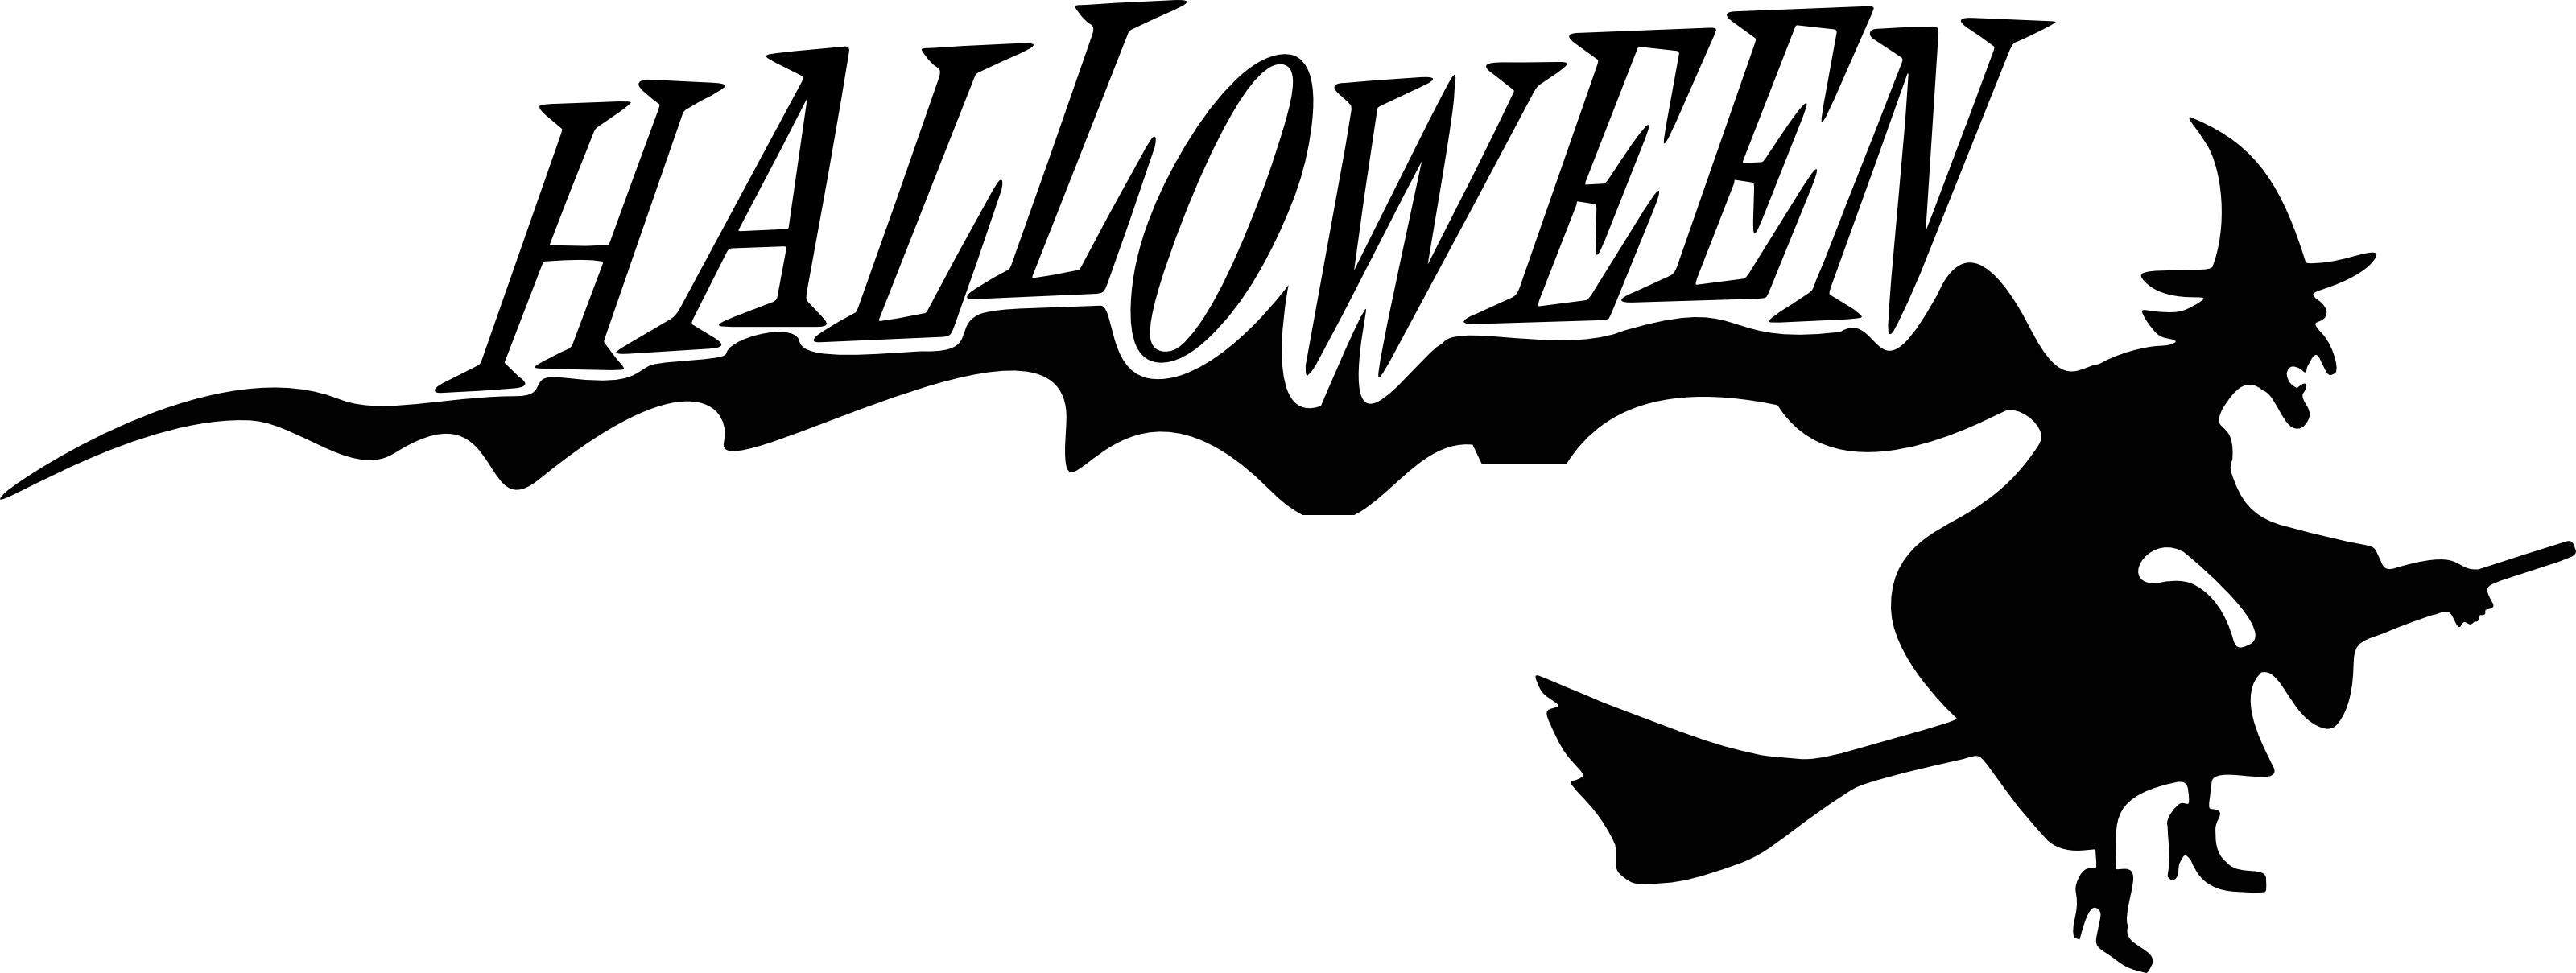 Happy Halloween Clip Art Black And White.